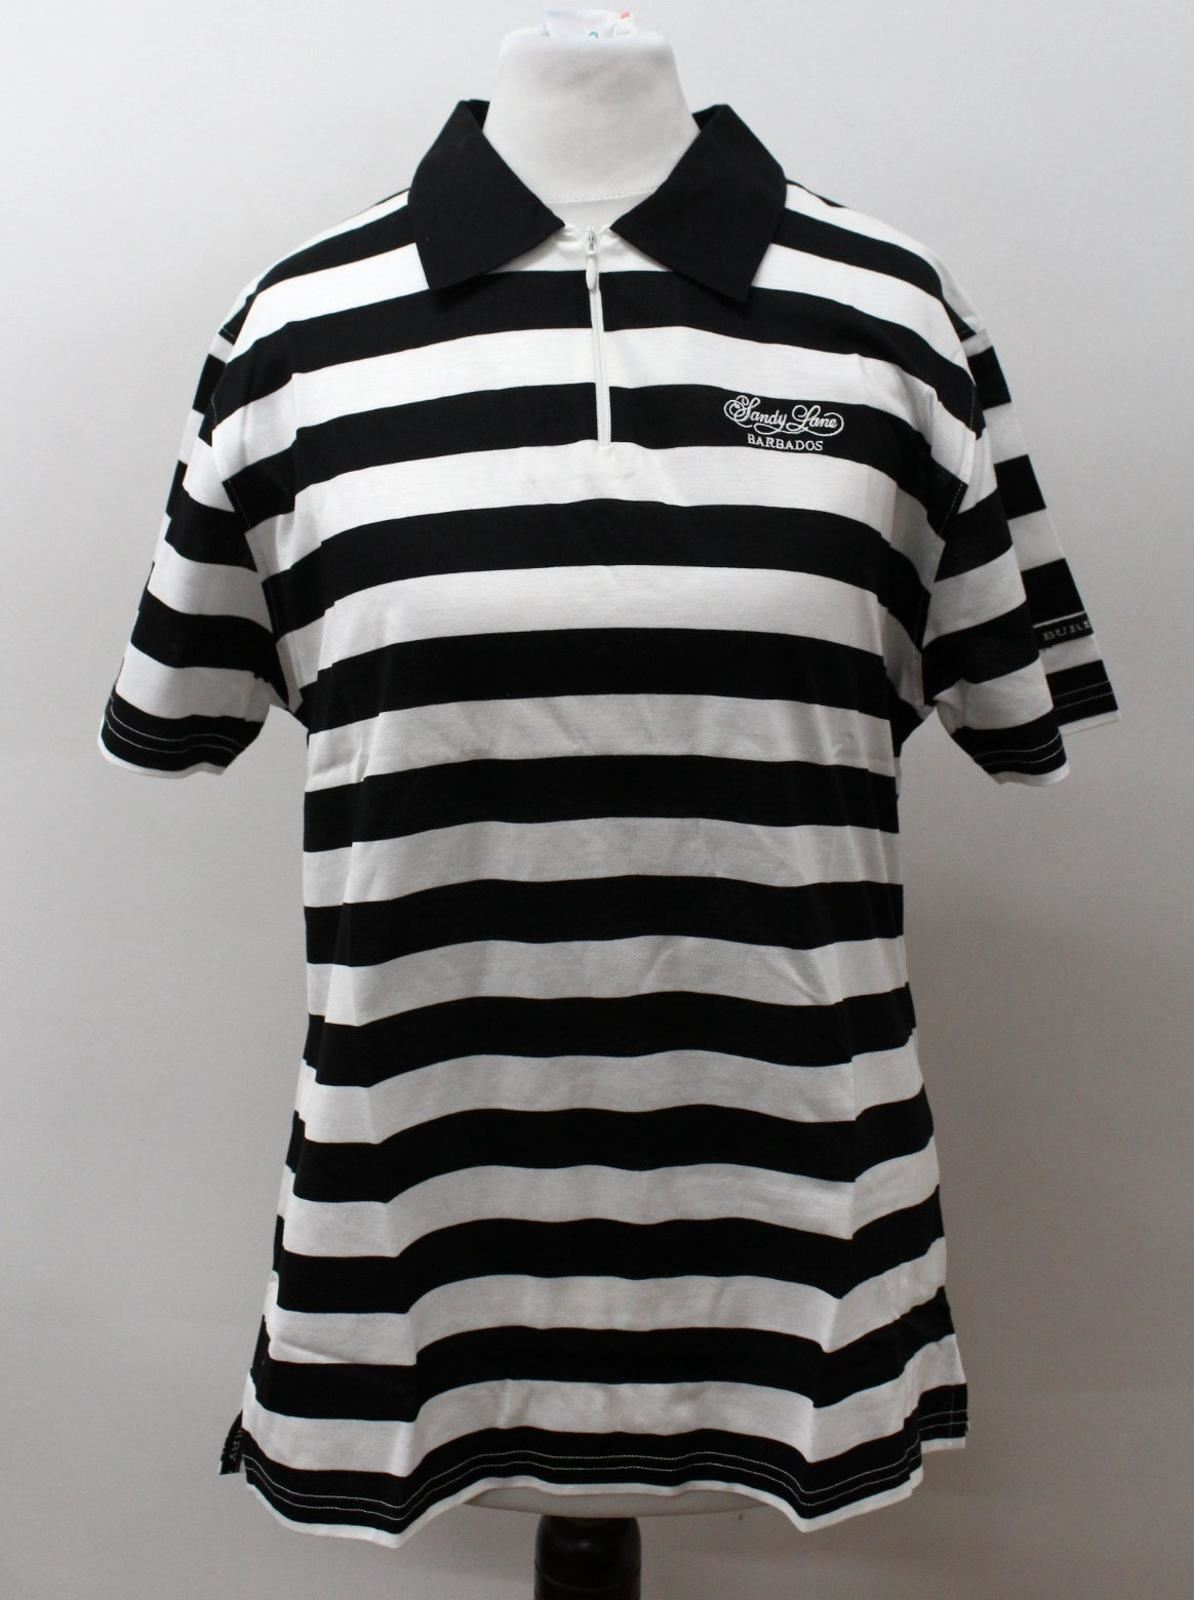 BURBERRY-GOLF-Ladies-Black-White-Cotton-Short-Sleeve-Striped-Polo-Shirt-S-BNWT